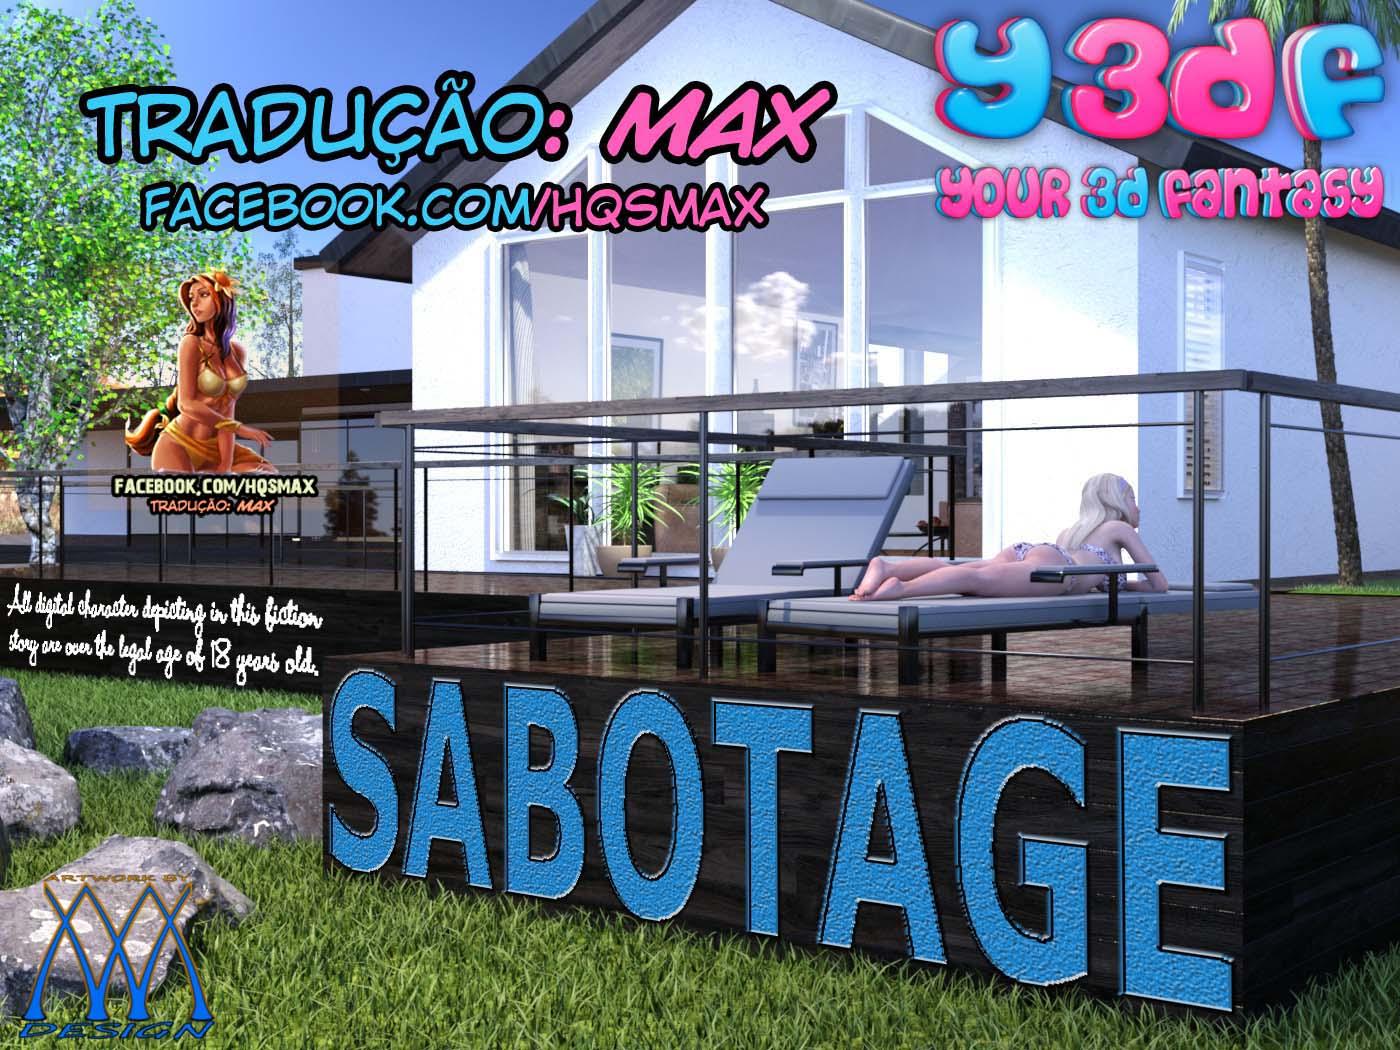 Sabotage-1